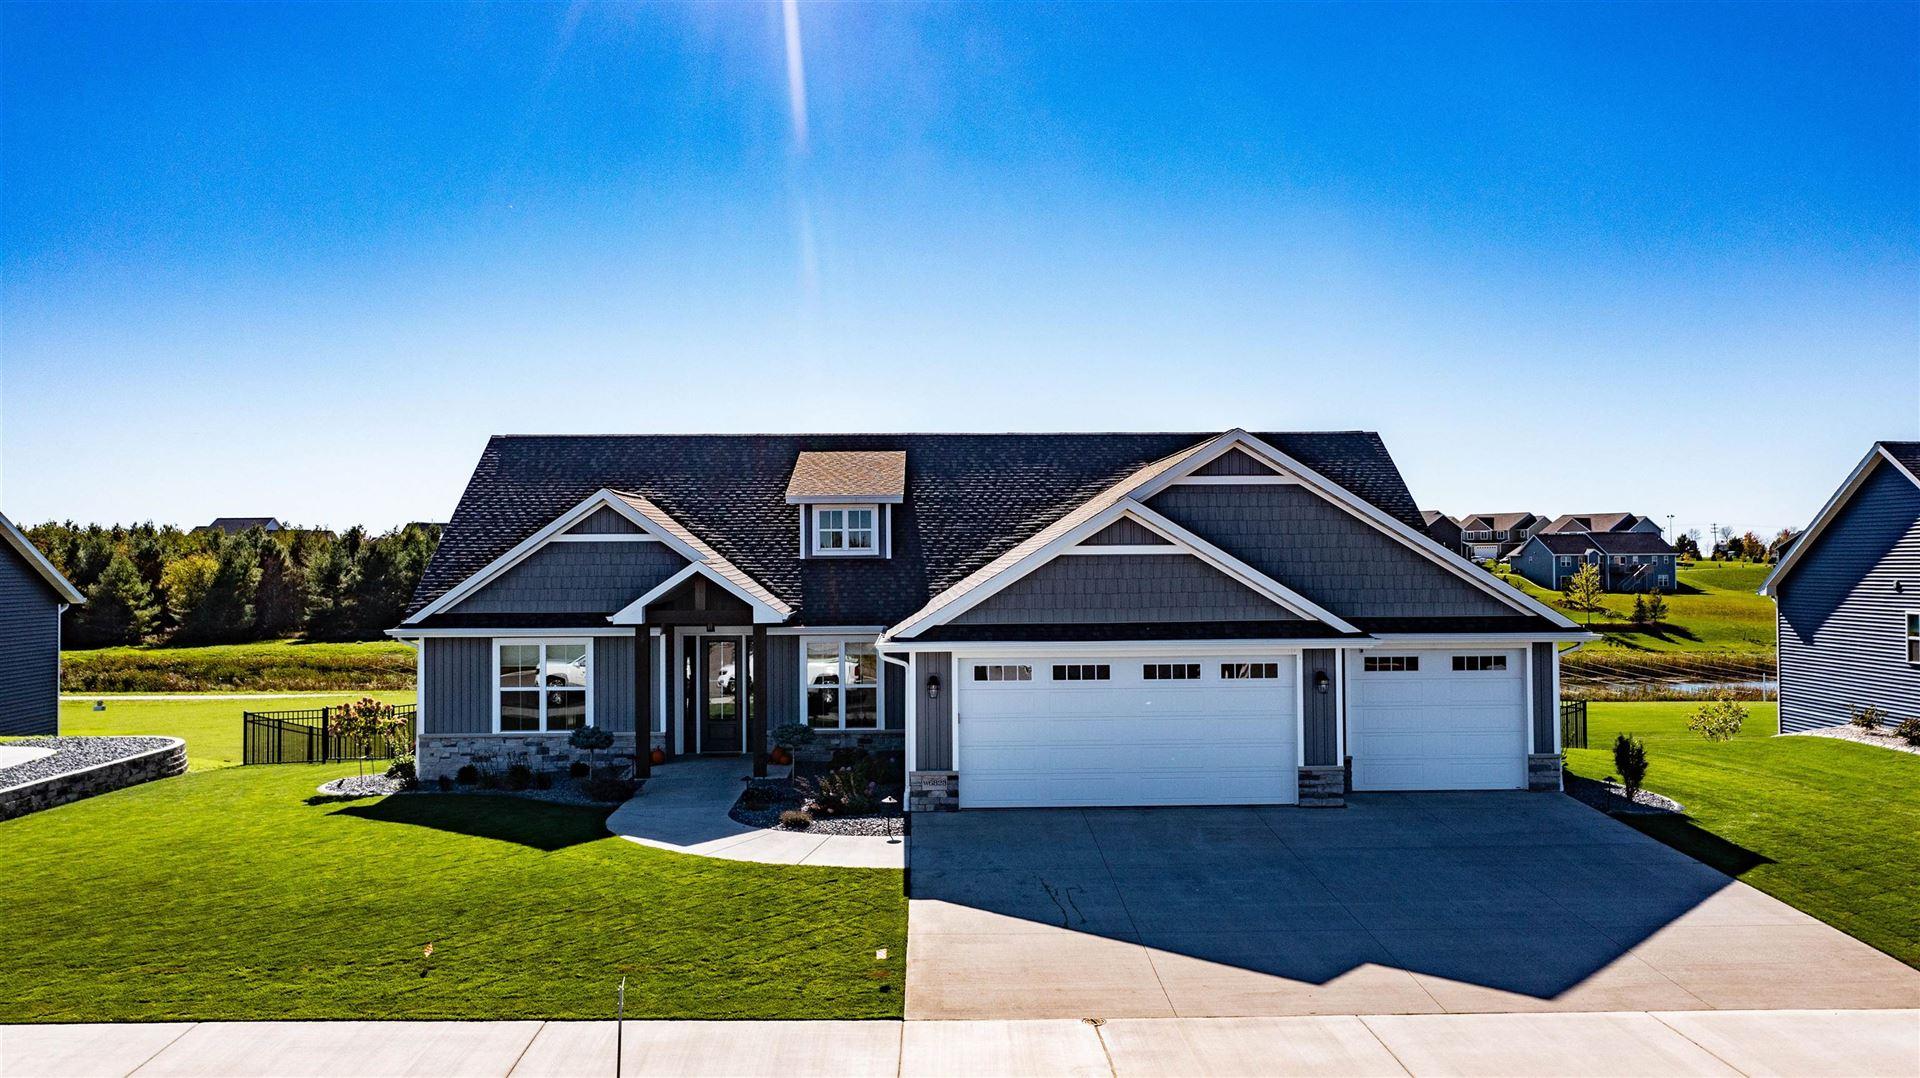 W6823 DESIGN Drive, Greenville, WI 54942 - MLS#: 50249845